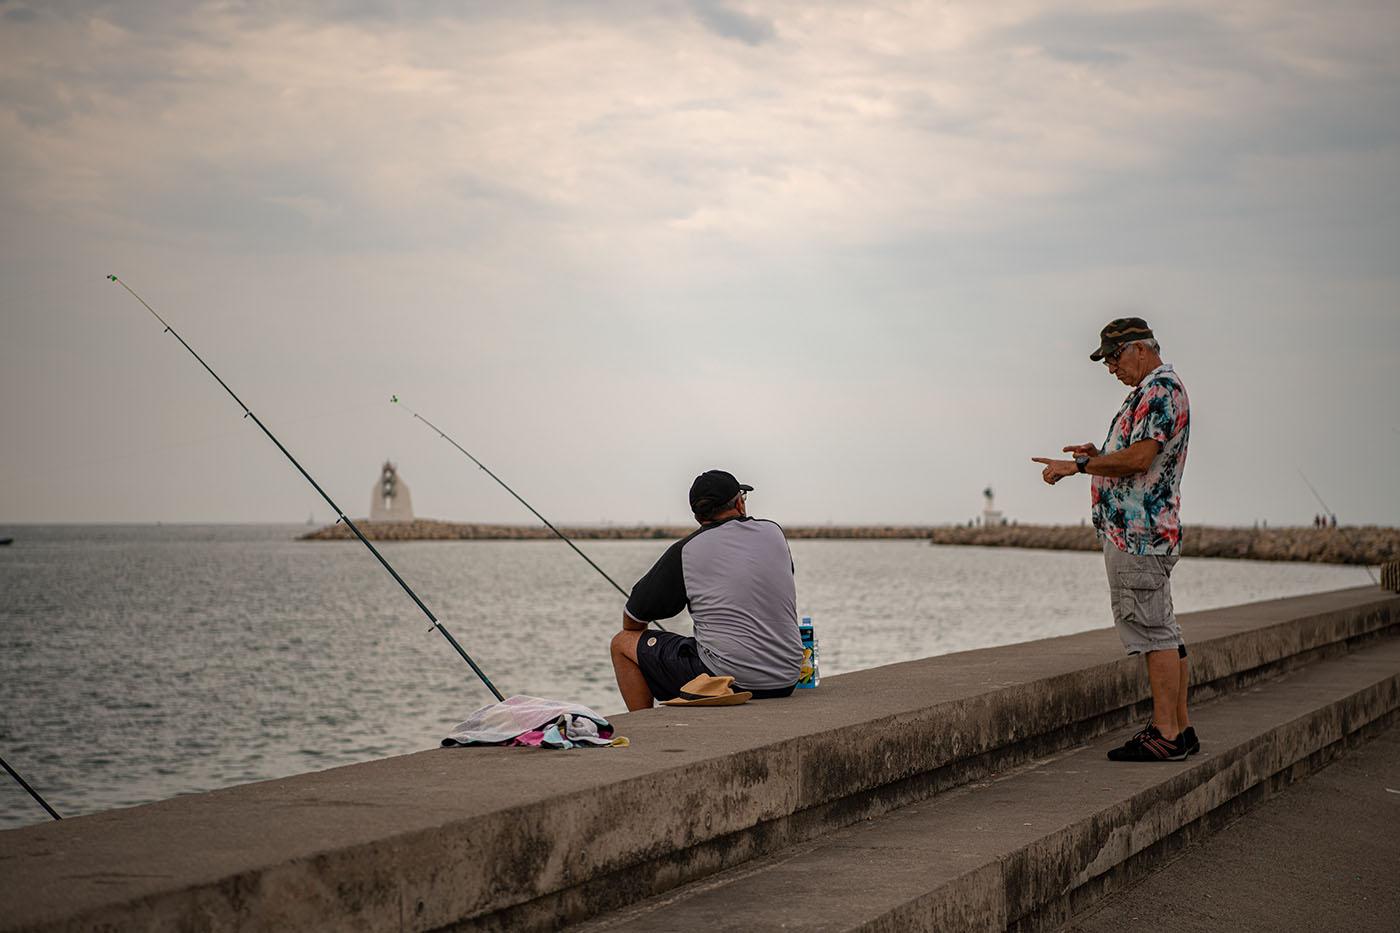 Angler an der Hafenmole